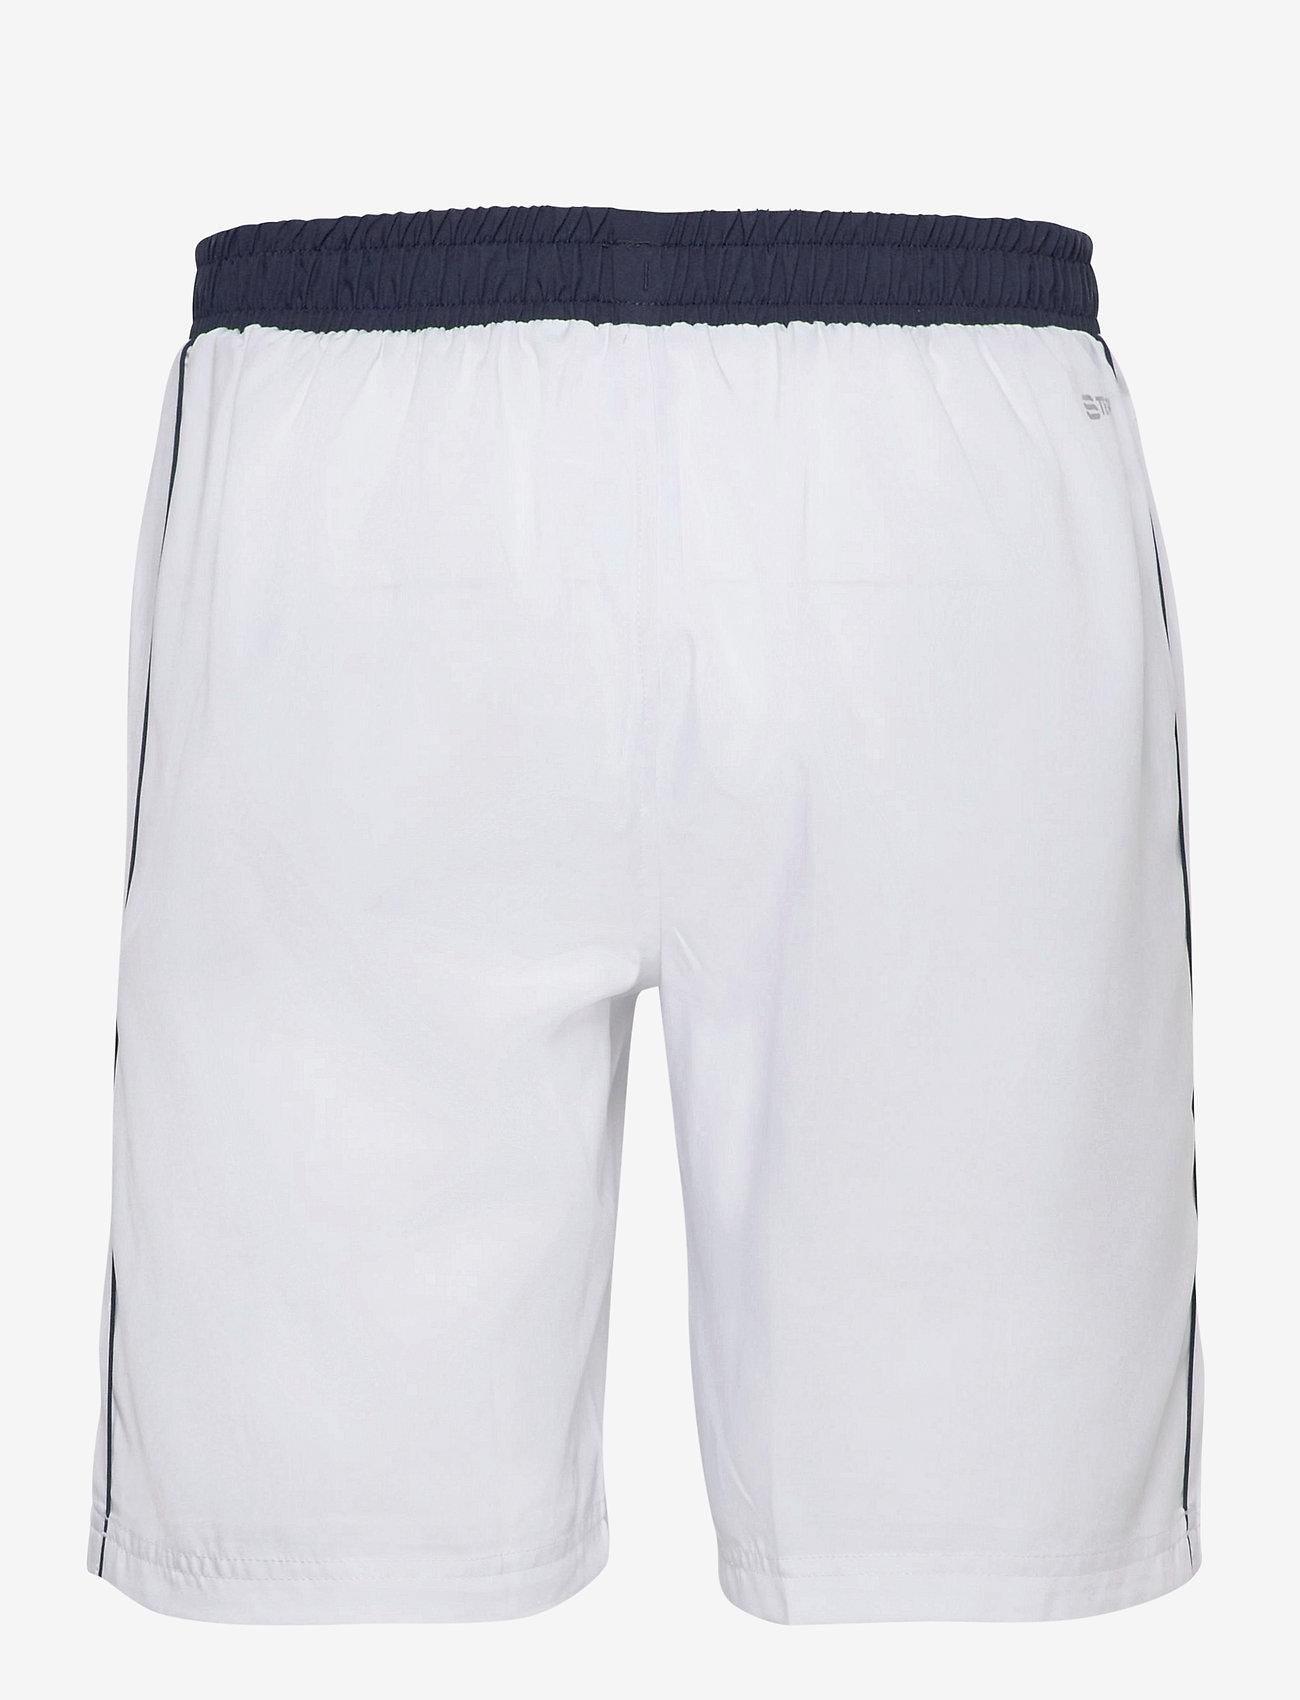 Sergio Tacchini - CLUB TECH SHORTS - training korte broek - white/navy - 1